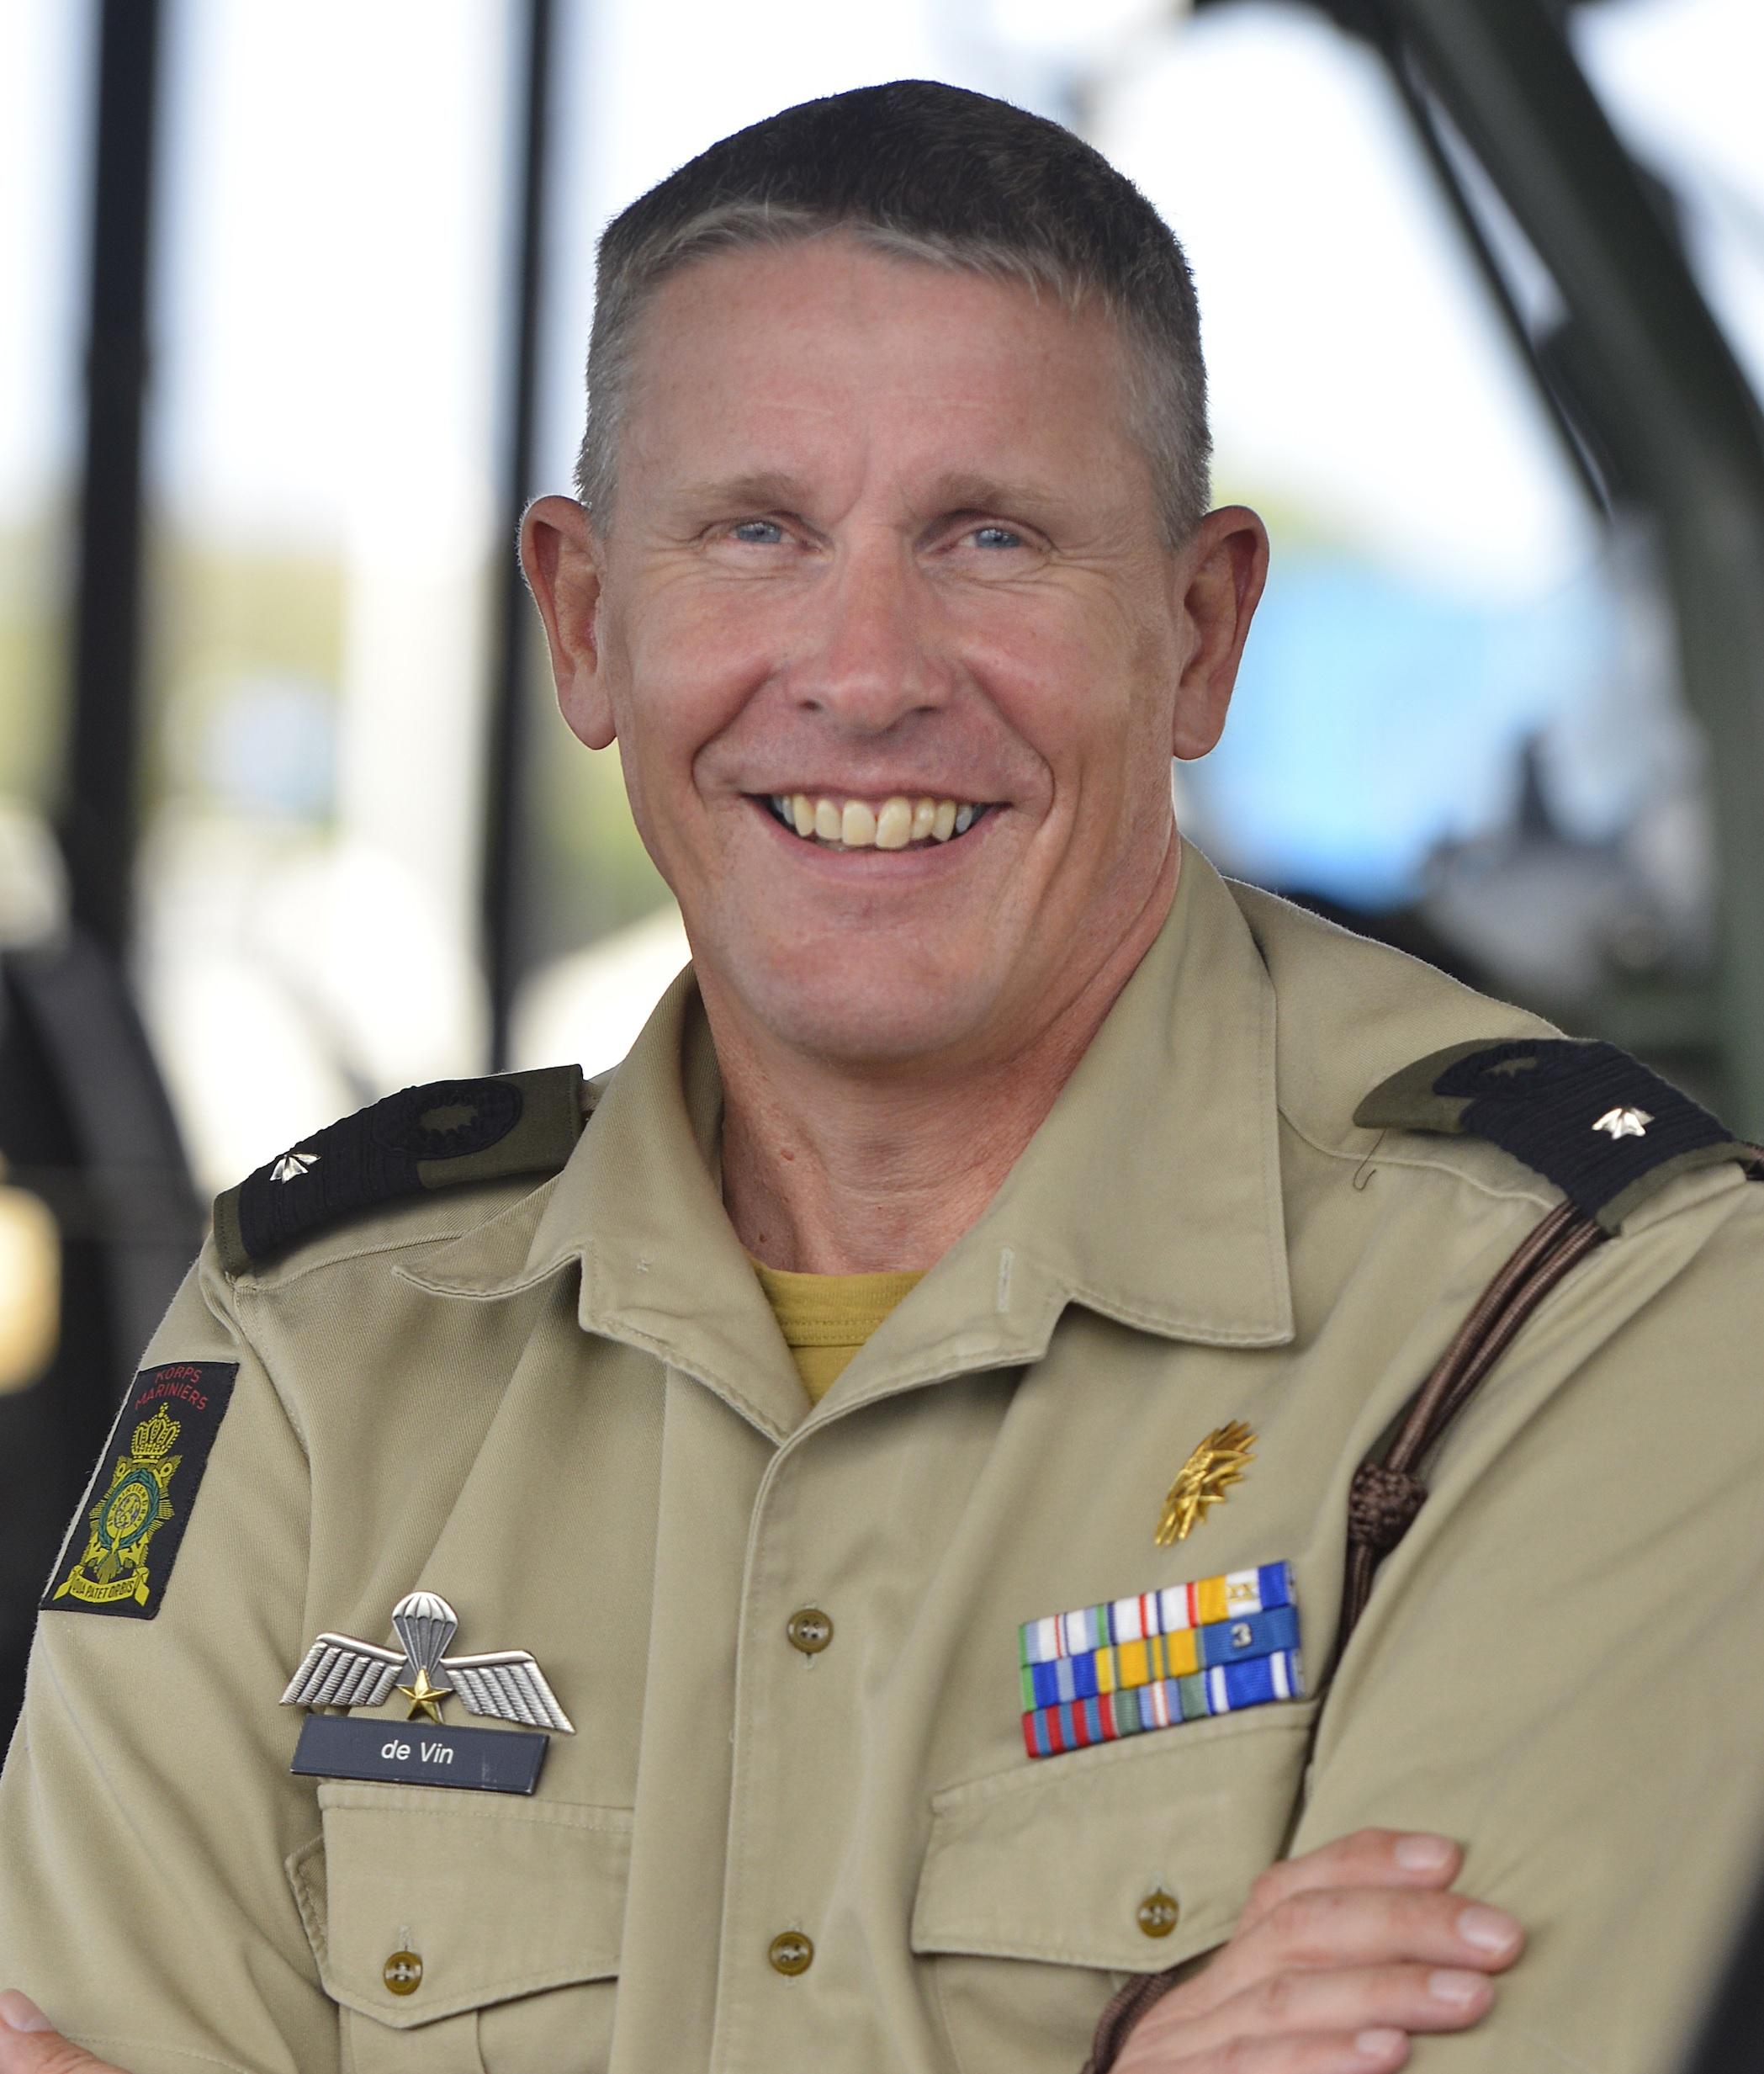 Brigadier General Peter Jan de Vin